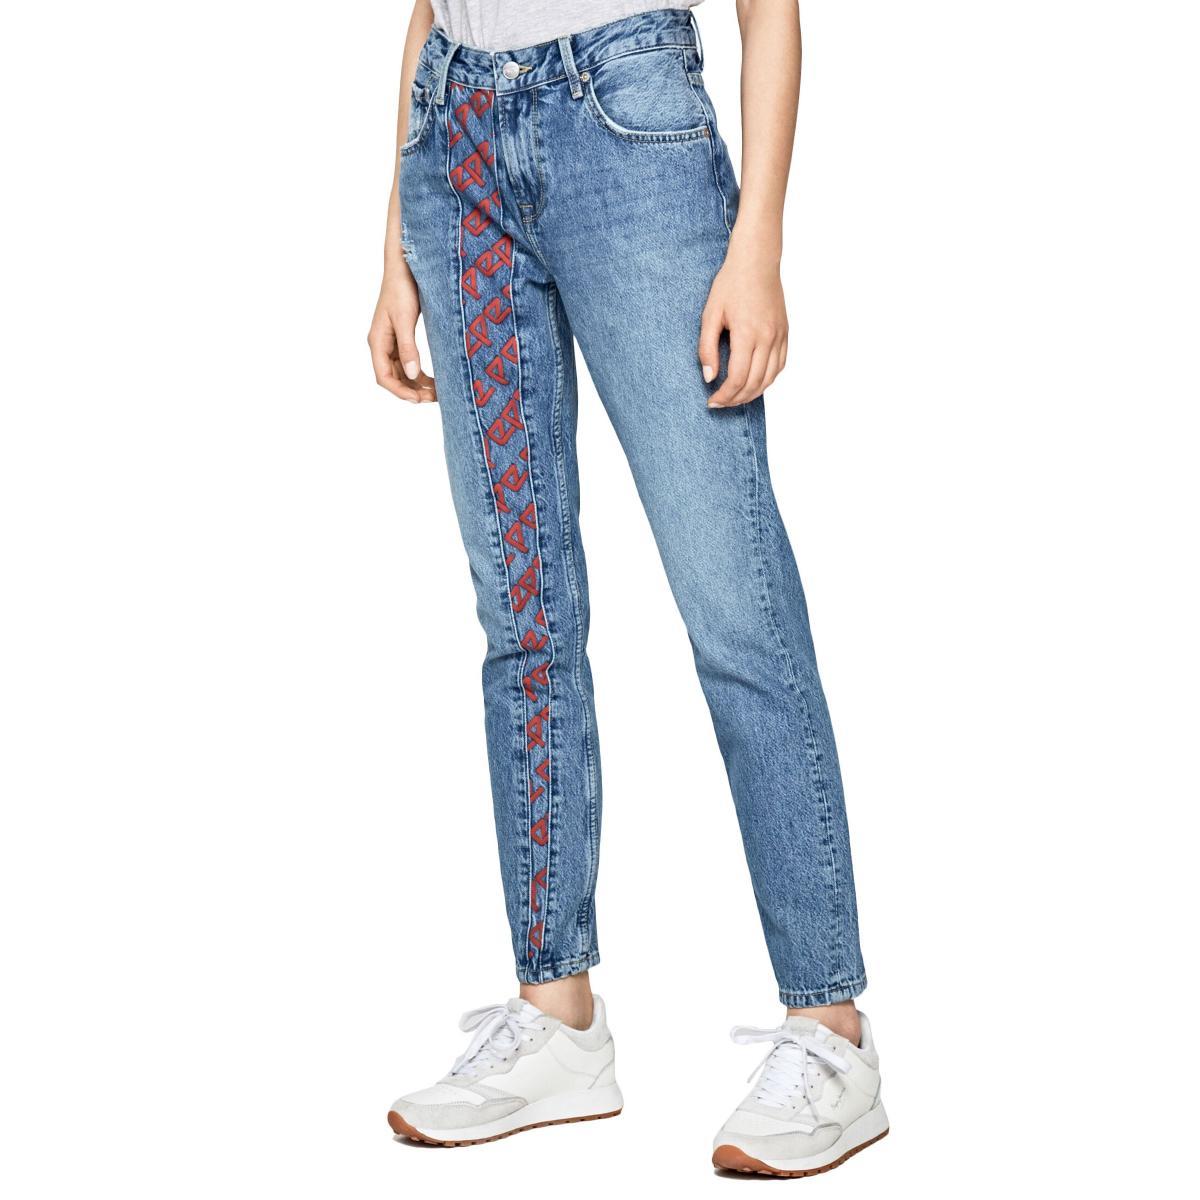 Jeans Pepe Jeans Violet archive con stampa da donna rif. PL203435R VIOLET ARCHIVE